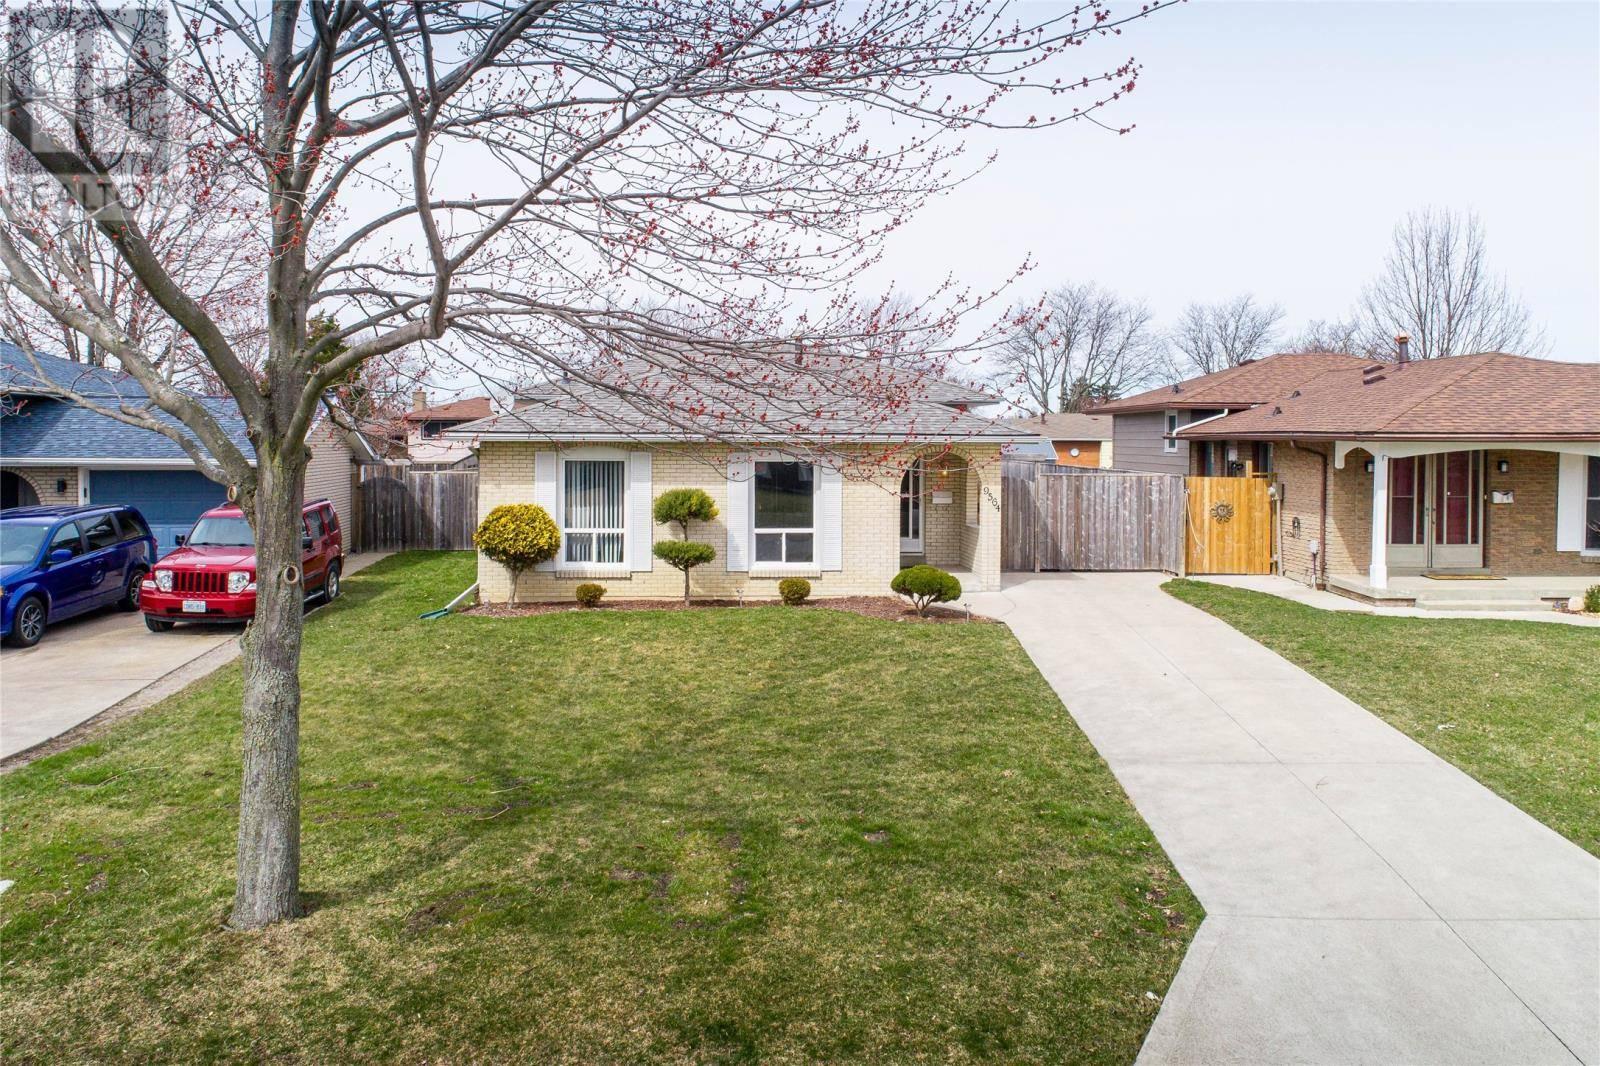 House for sale at 9564 Chestnut Dr Windsor Ontario - MLS: 20003630